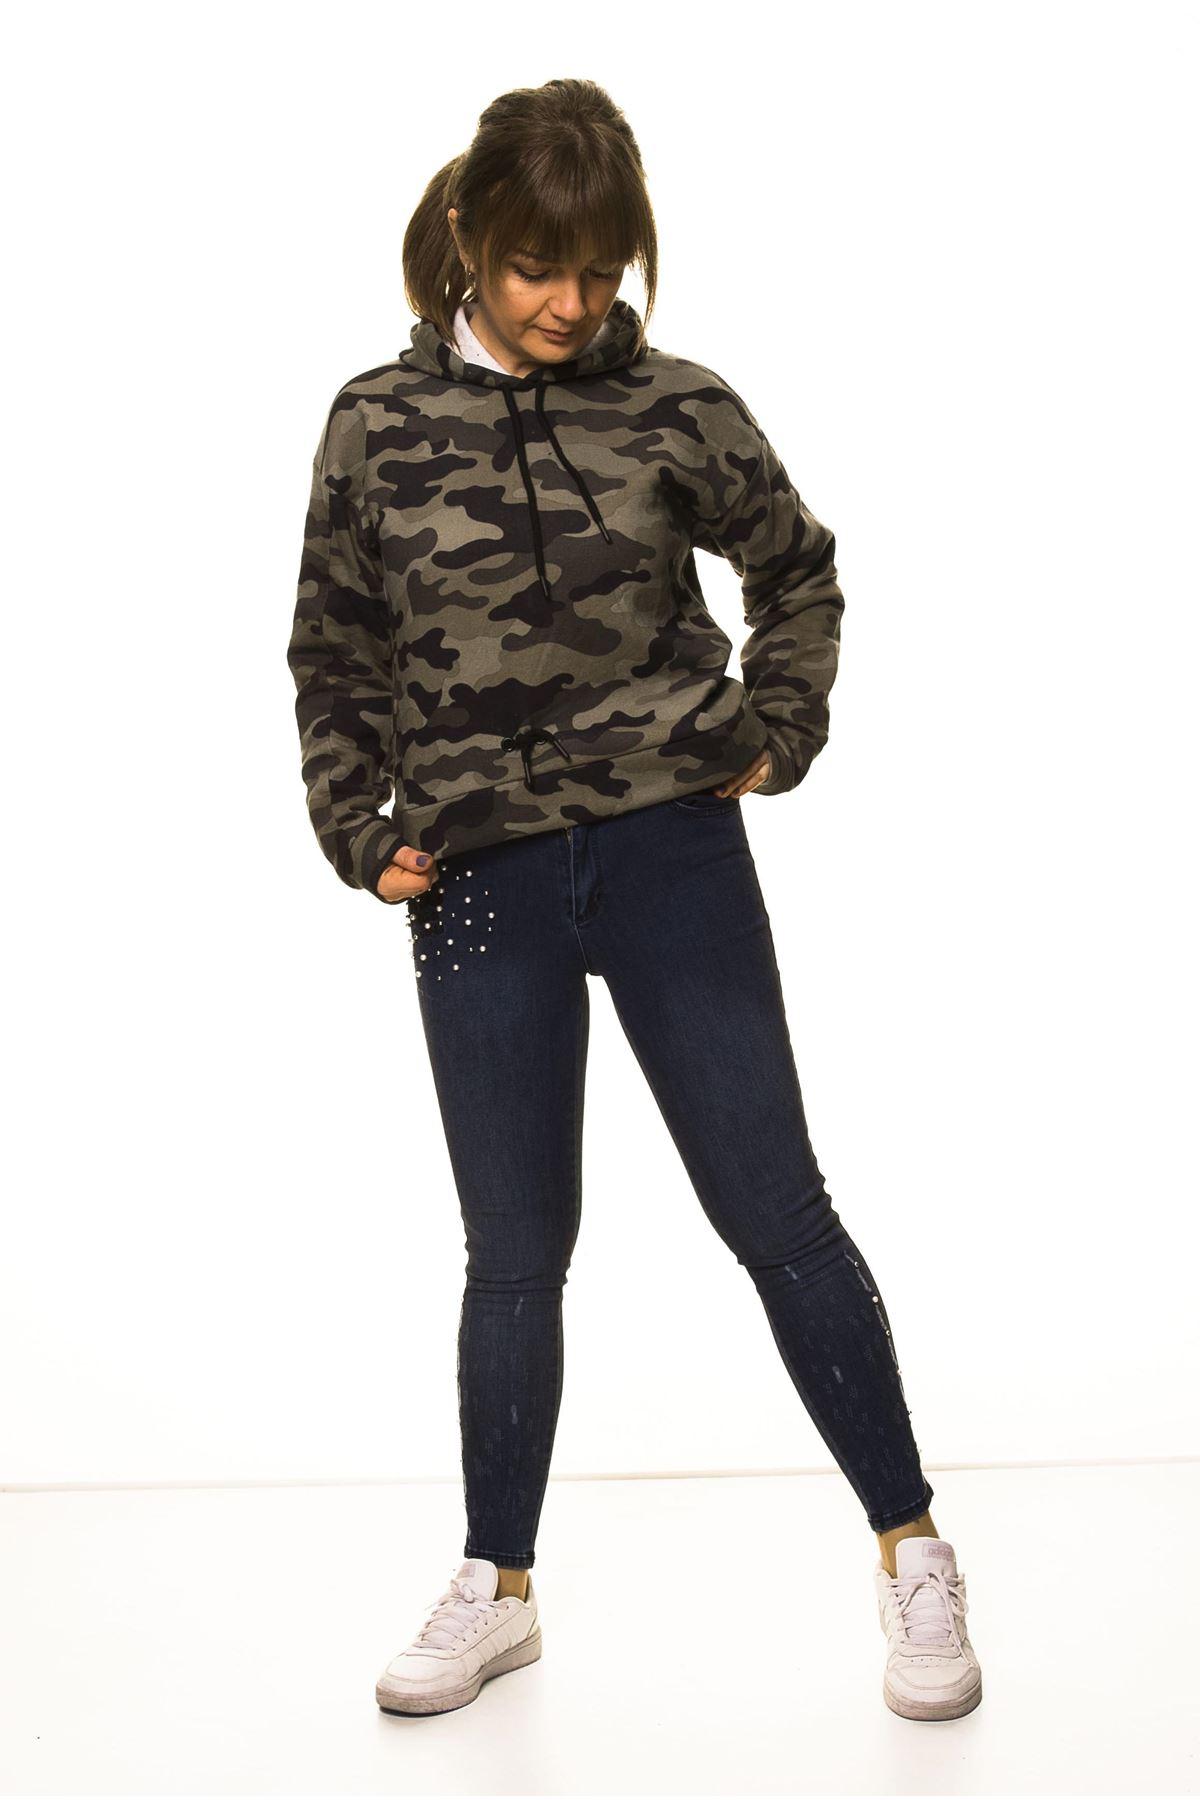 Kadın Kamuflaj Kapüşonlu Boyfriend  Sweatshirt 14C-3004-1